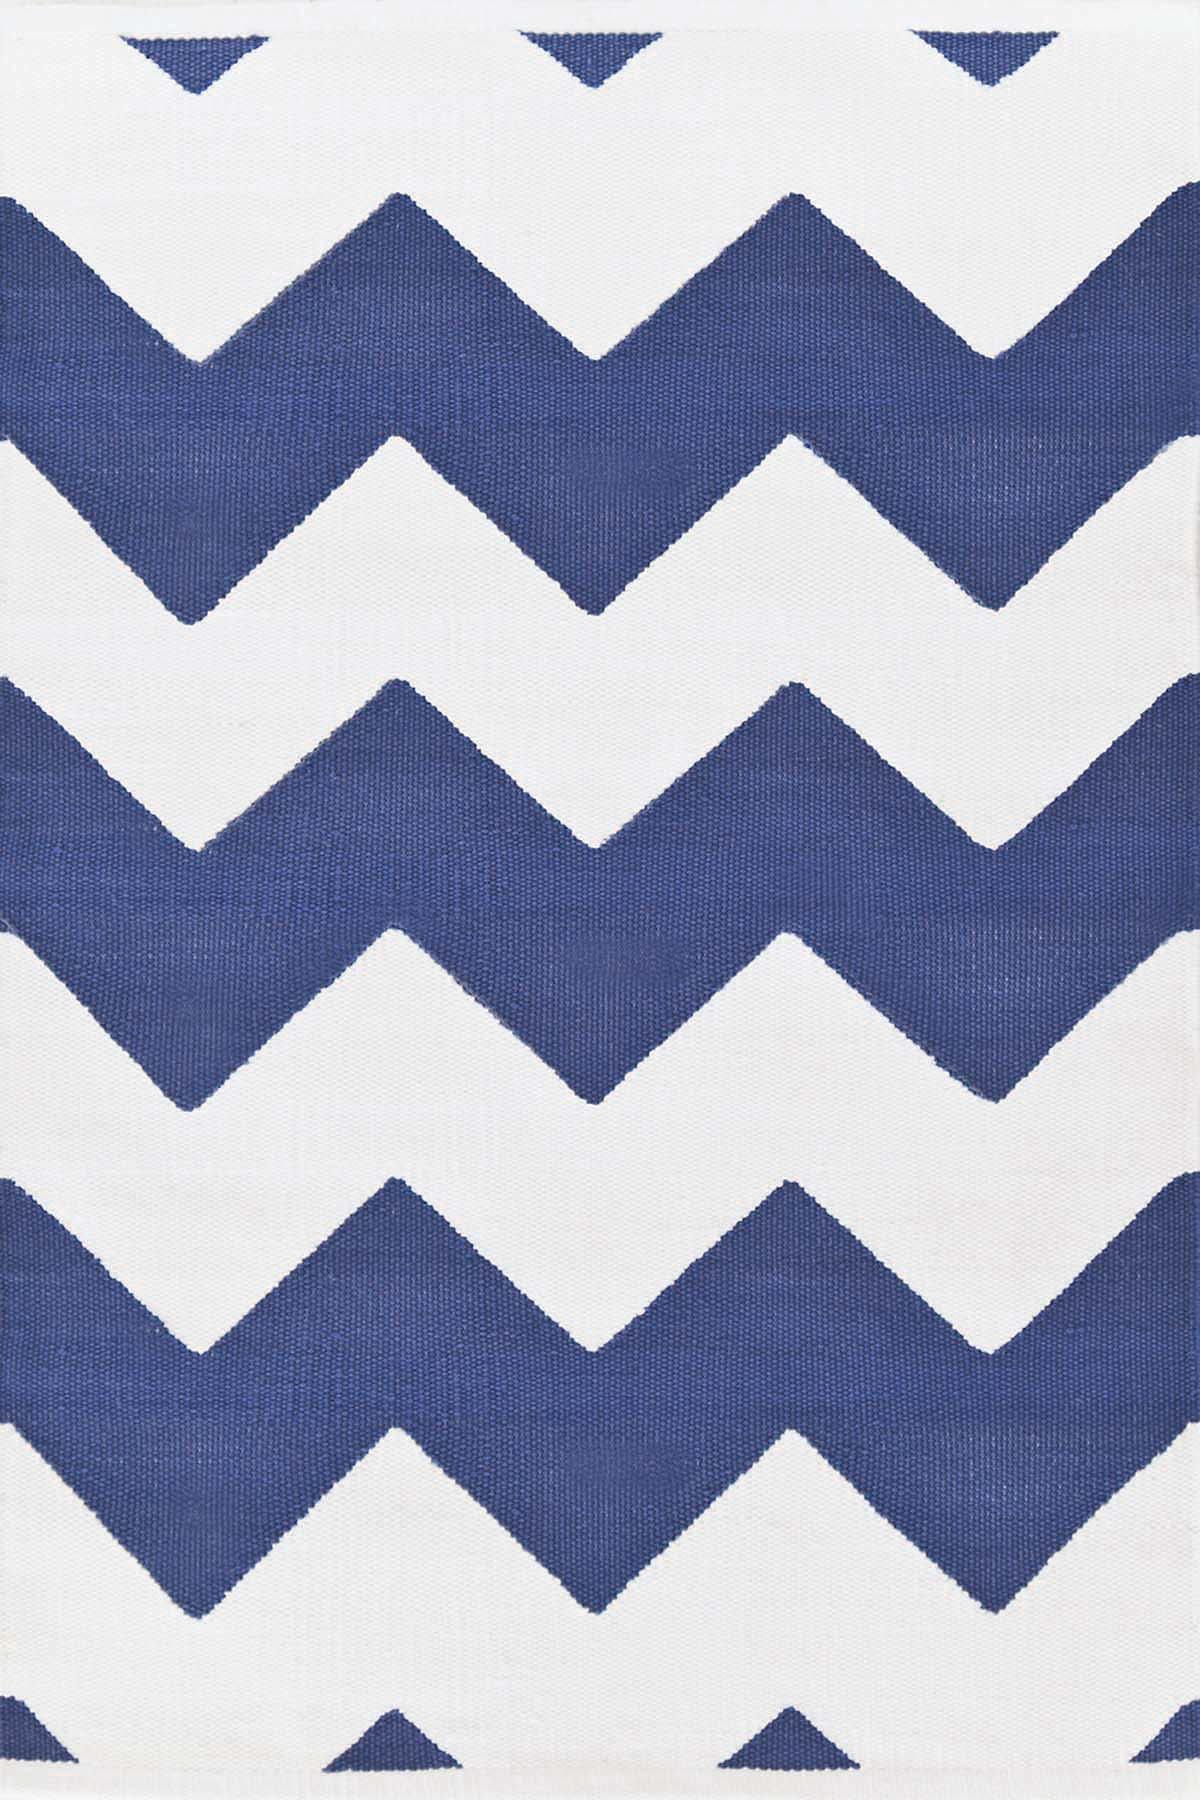 Chevron Denim/White Indoor/Outdoor Rug | The Outlet